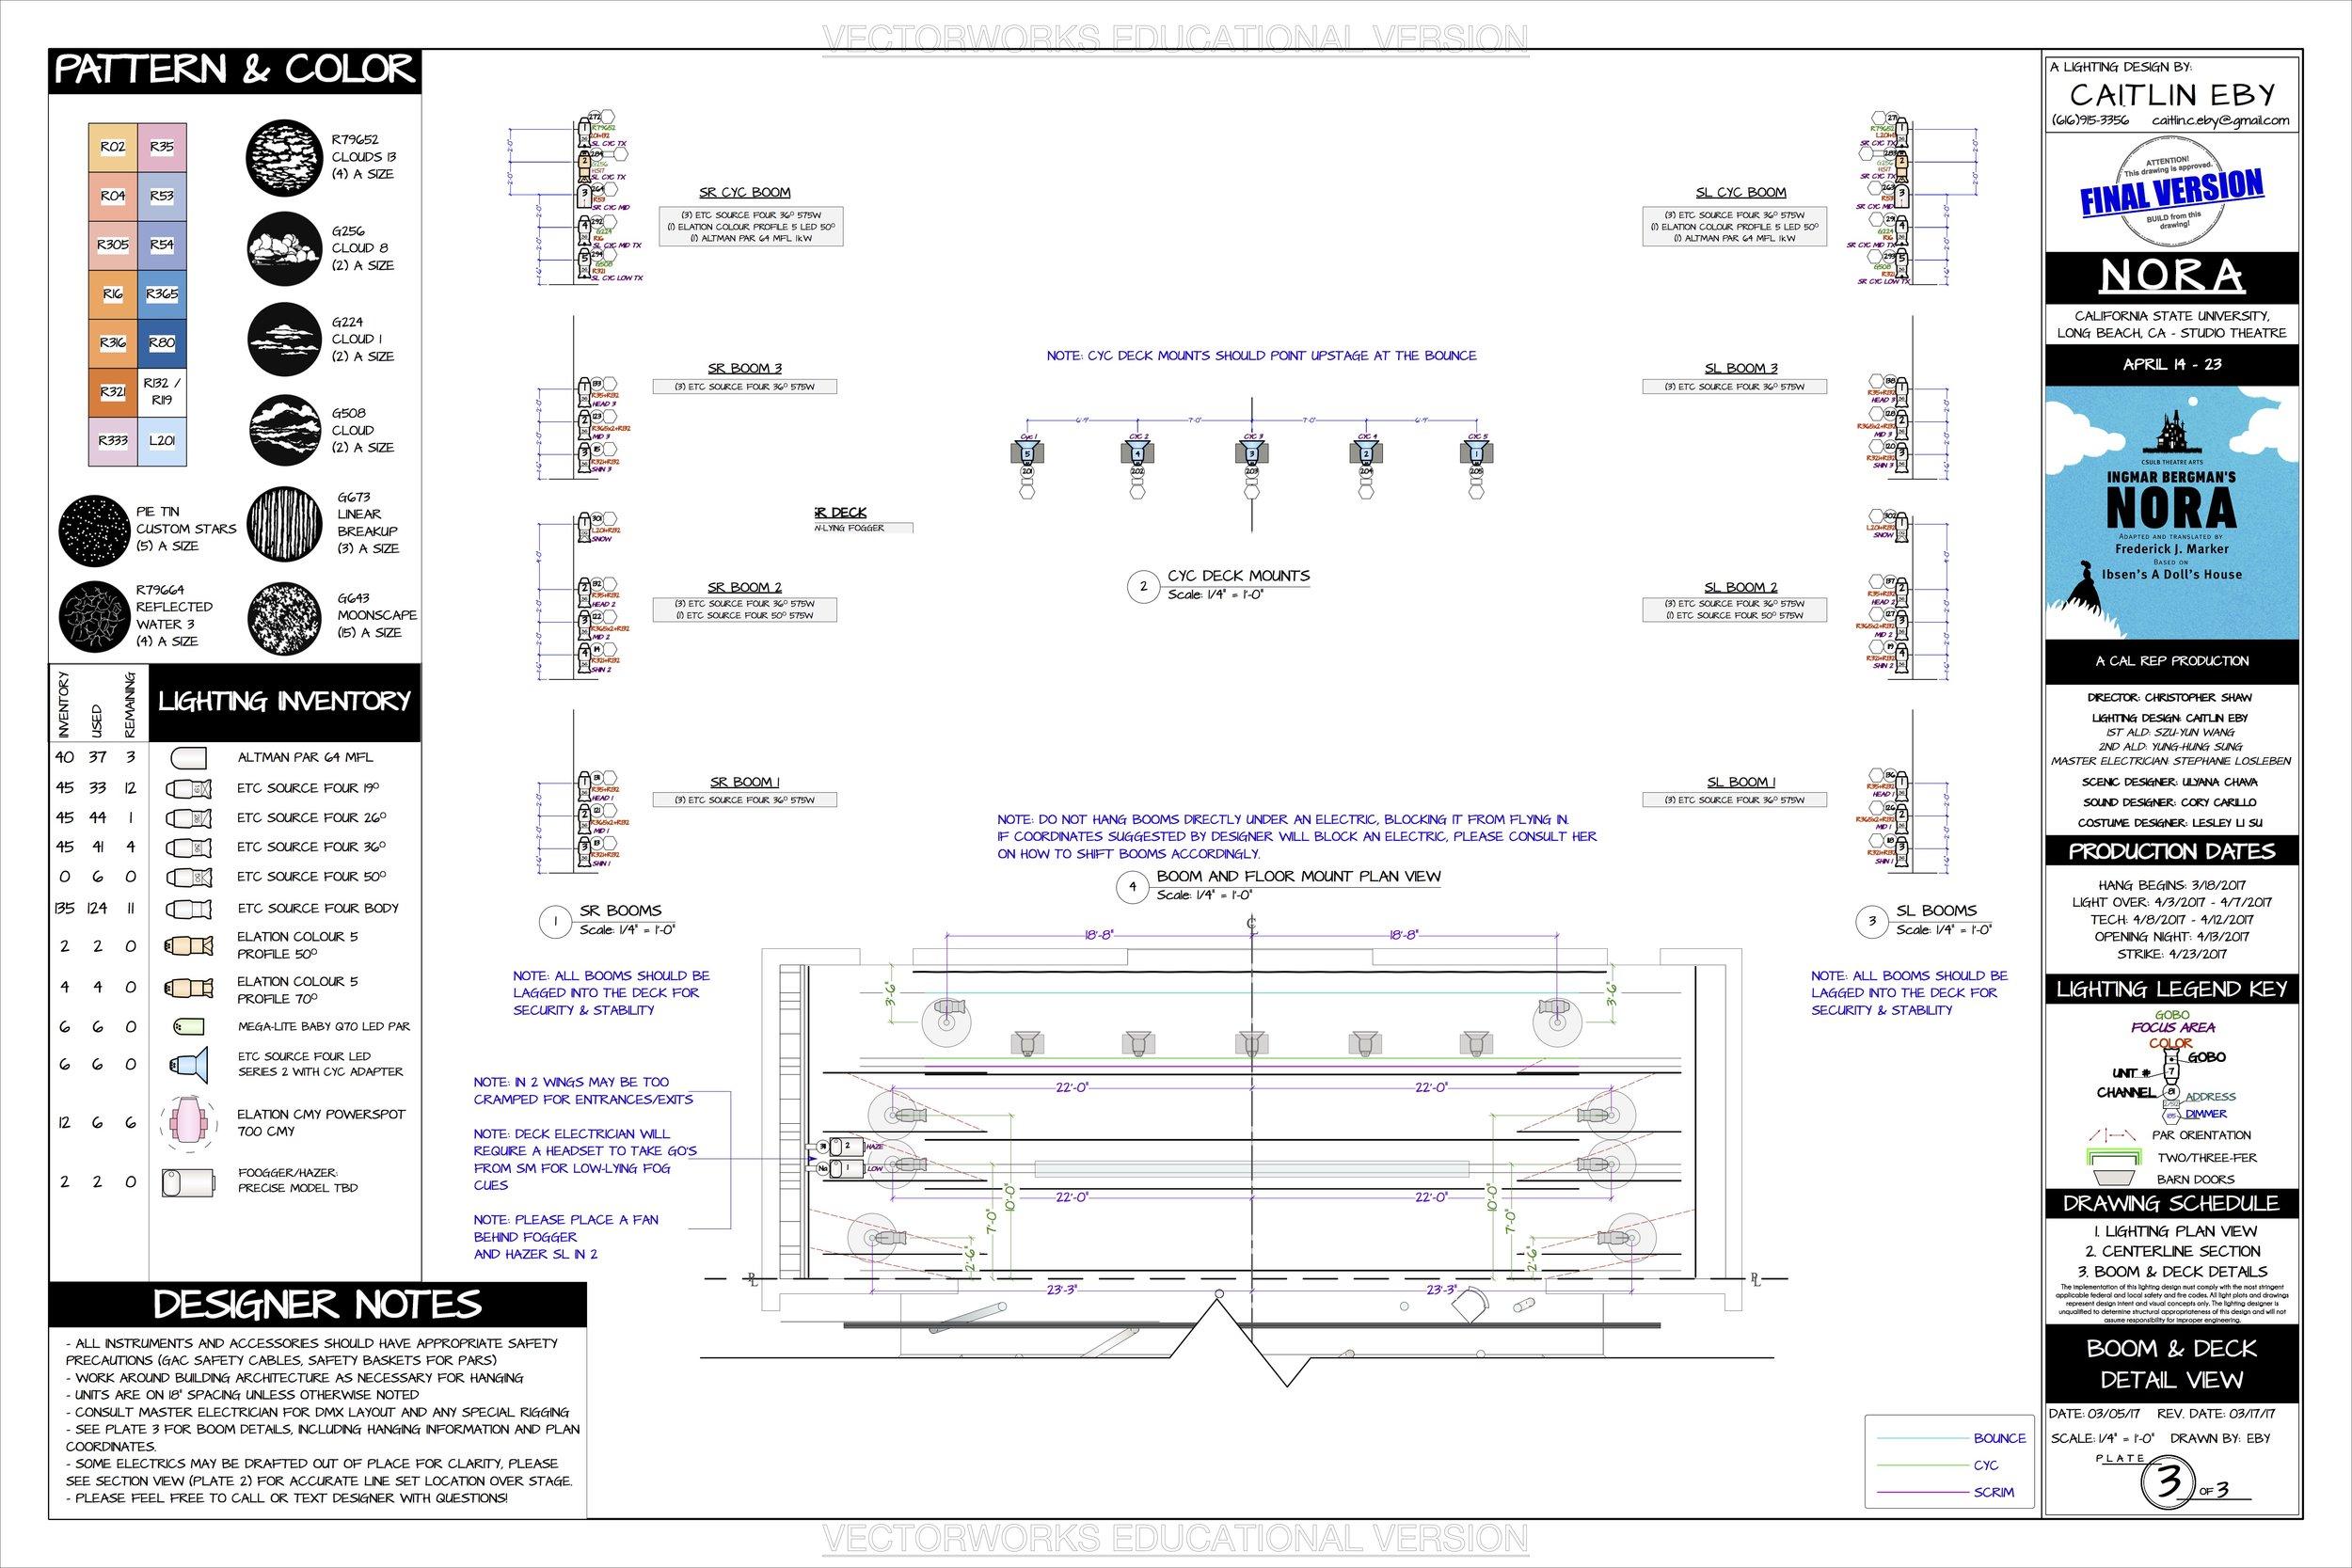 Nora-STU-LX-Details-032217.jpg